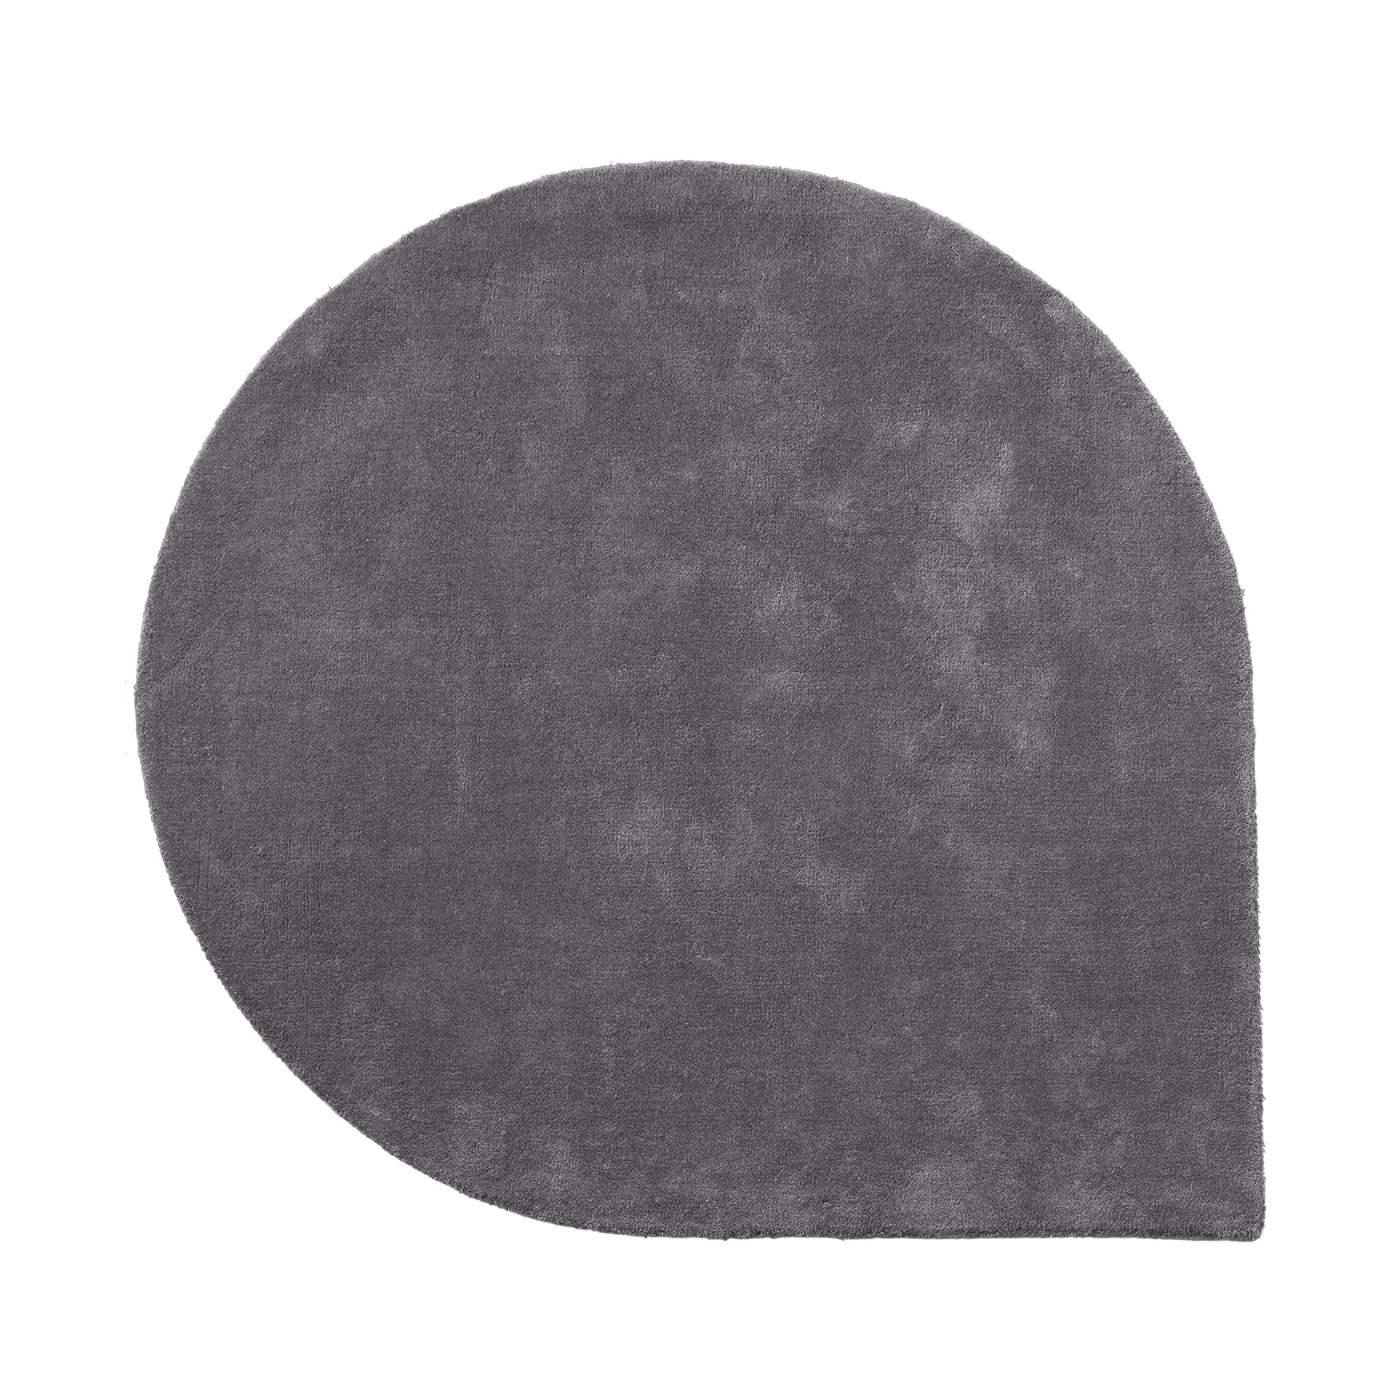 Droppformad matta STILLA grey small, AYTM